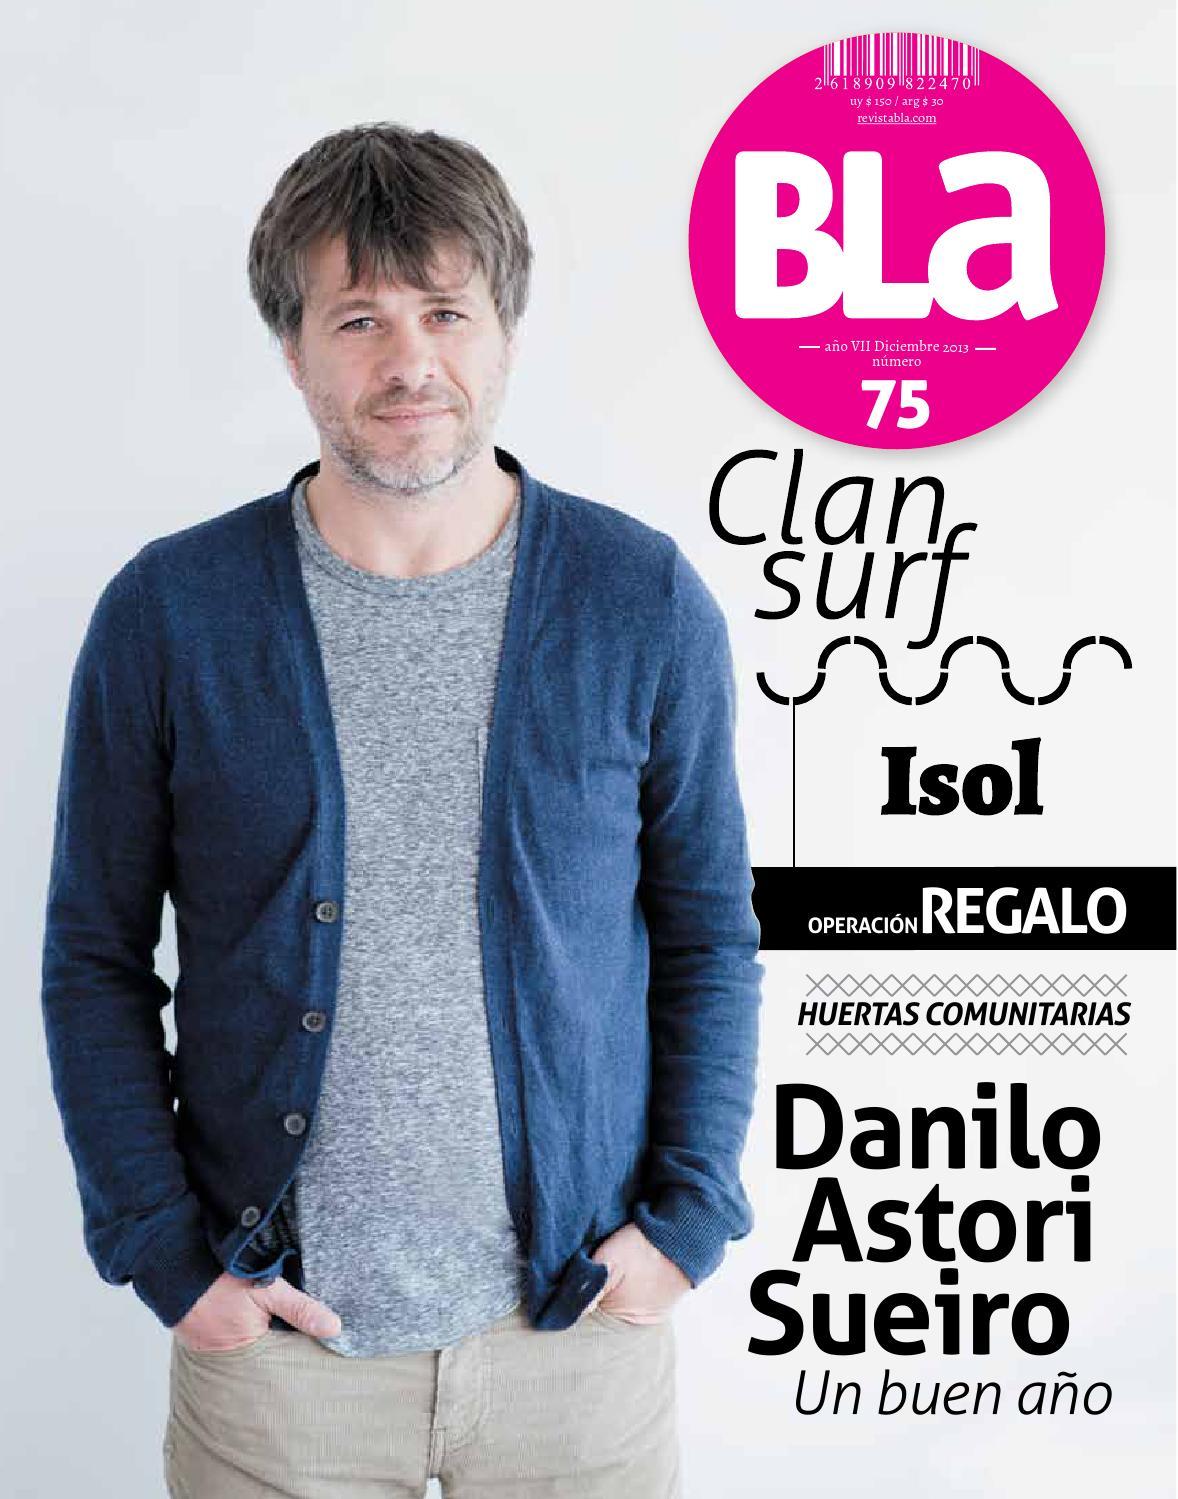 1edd2ac5c7 Bla 075 Diciembre by Editorial BLa - issuu